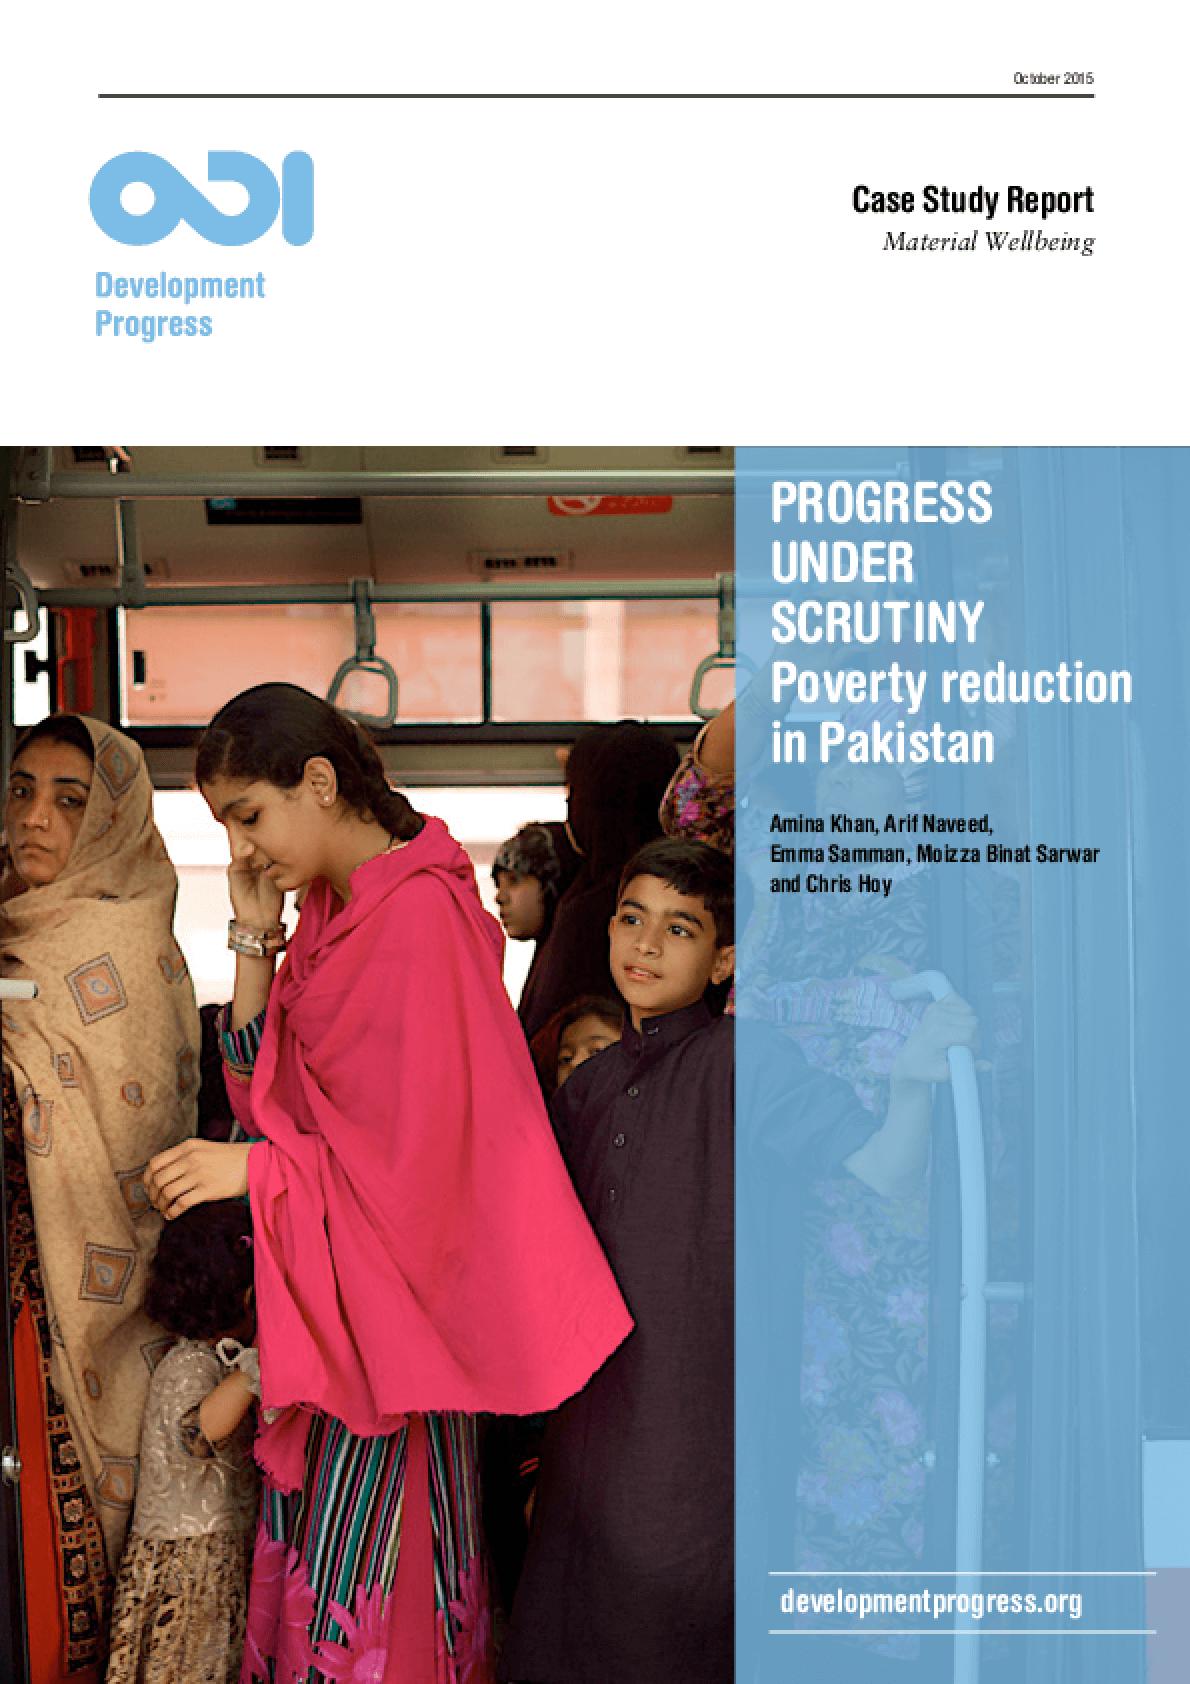 Progress Under Scrutiny: Poverty Reduction in Pakistan